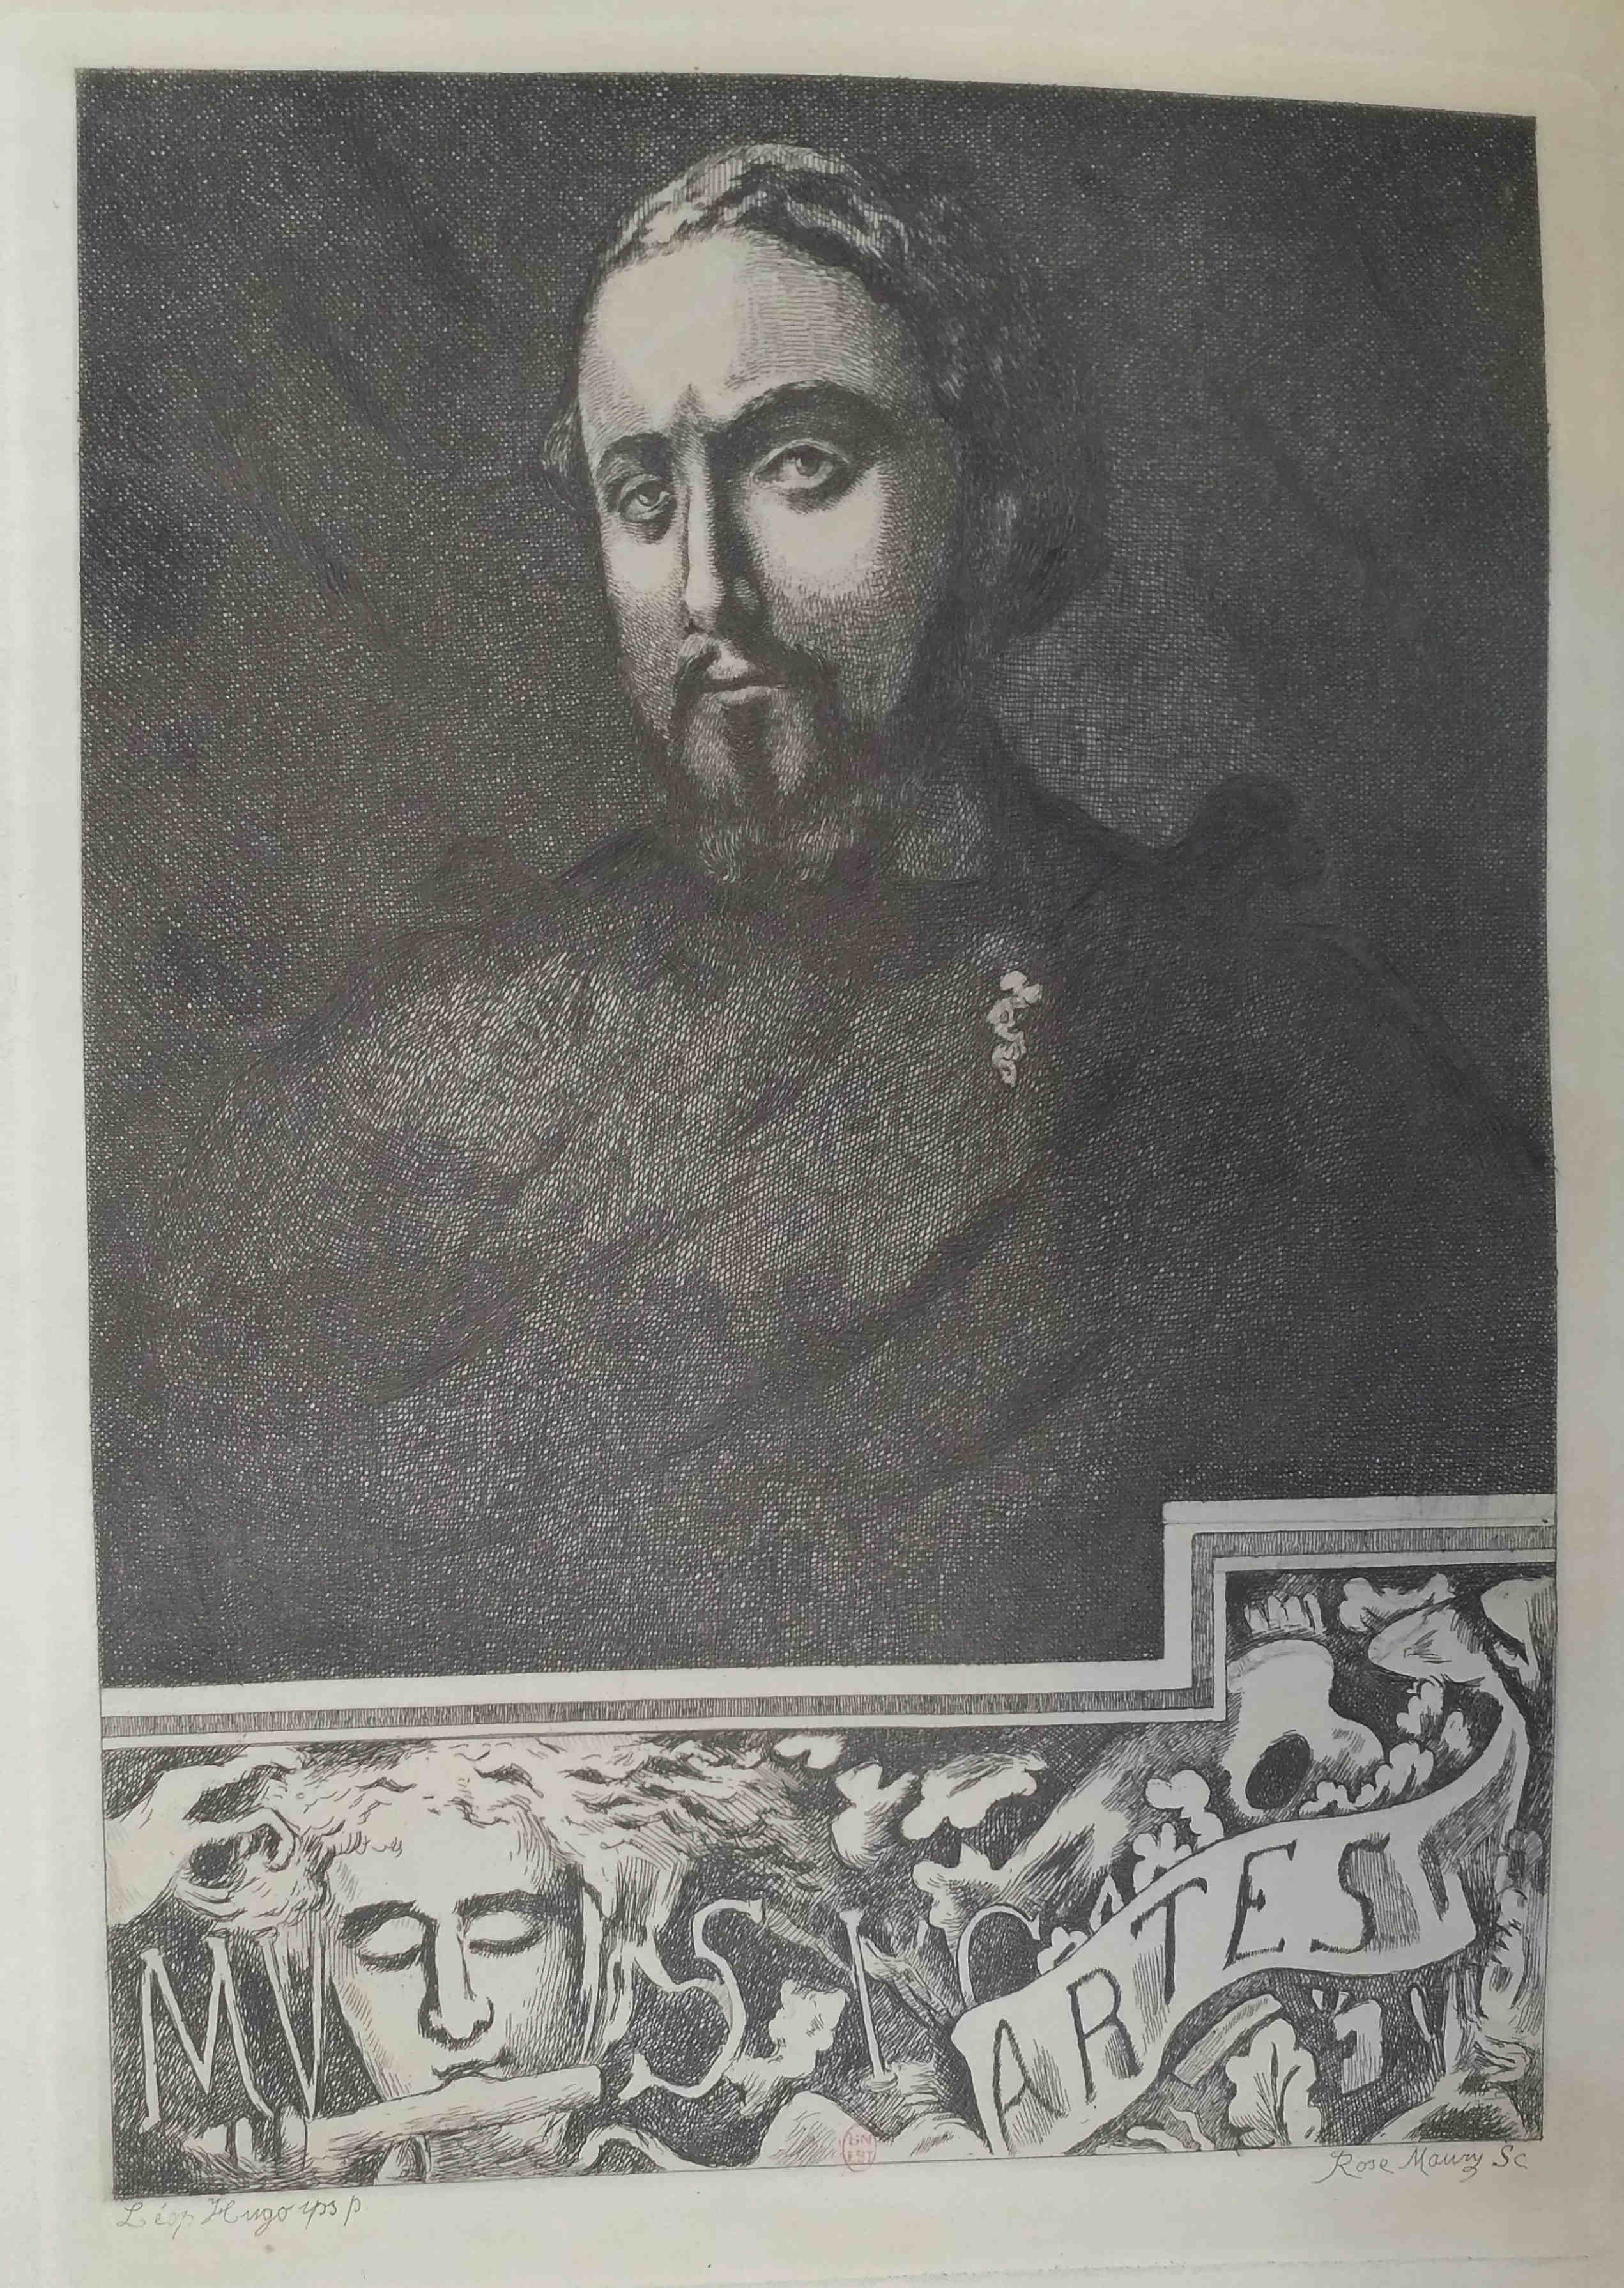 Leopold Armand Hugo BNF Autoportrait Musica Artes Rose Maury